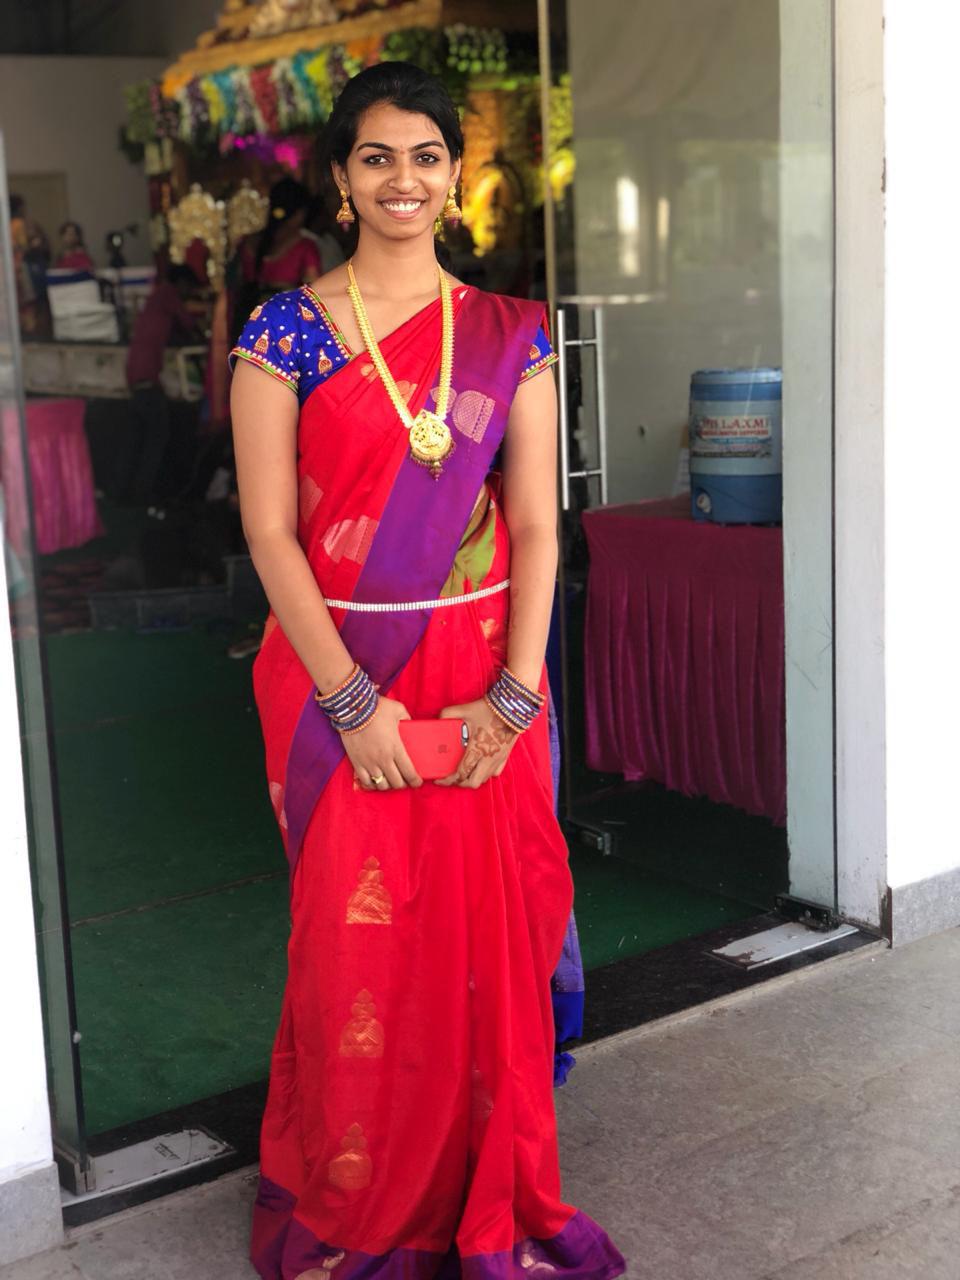 Contact - Pavani Marriage Bureau